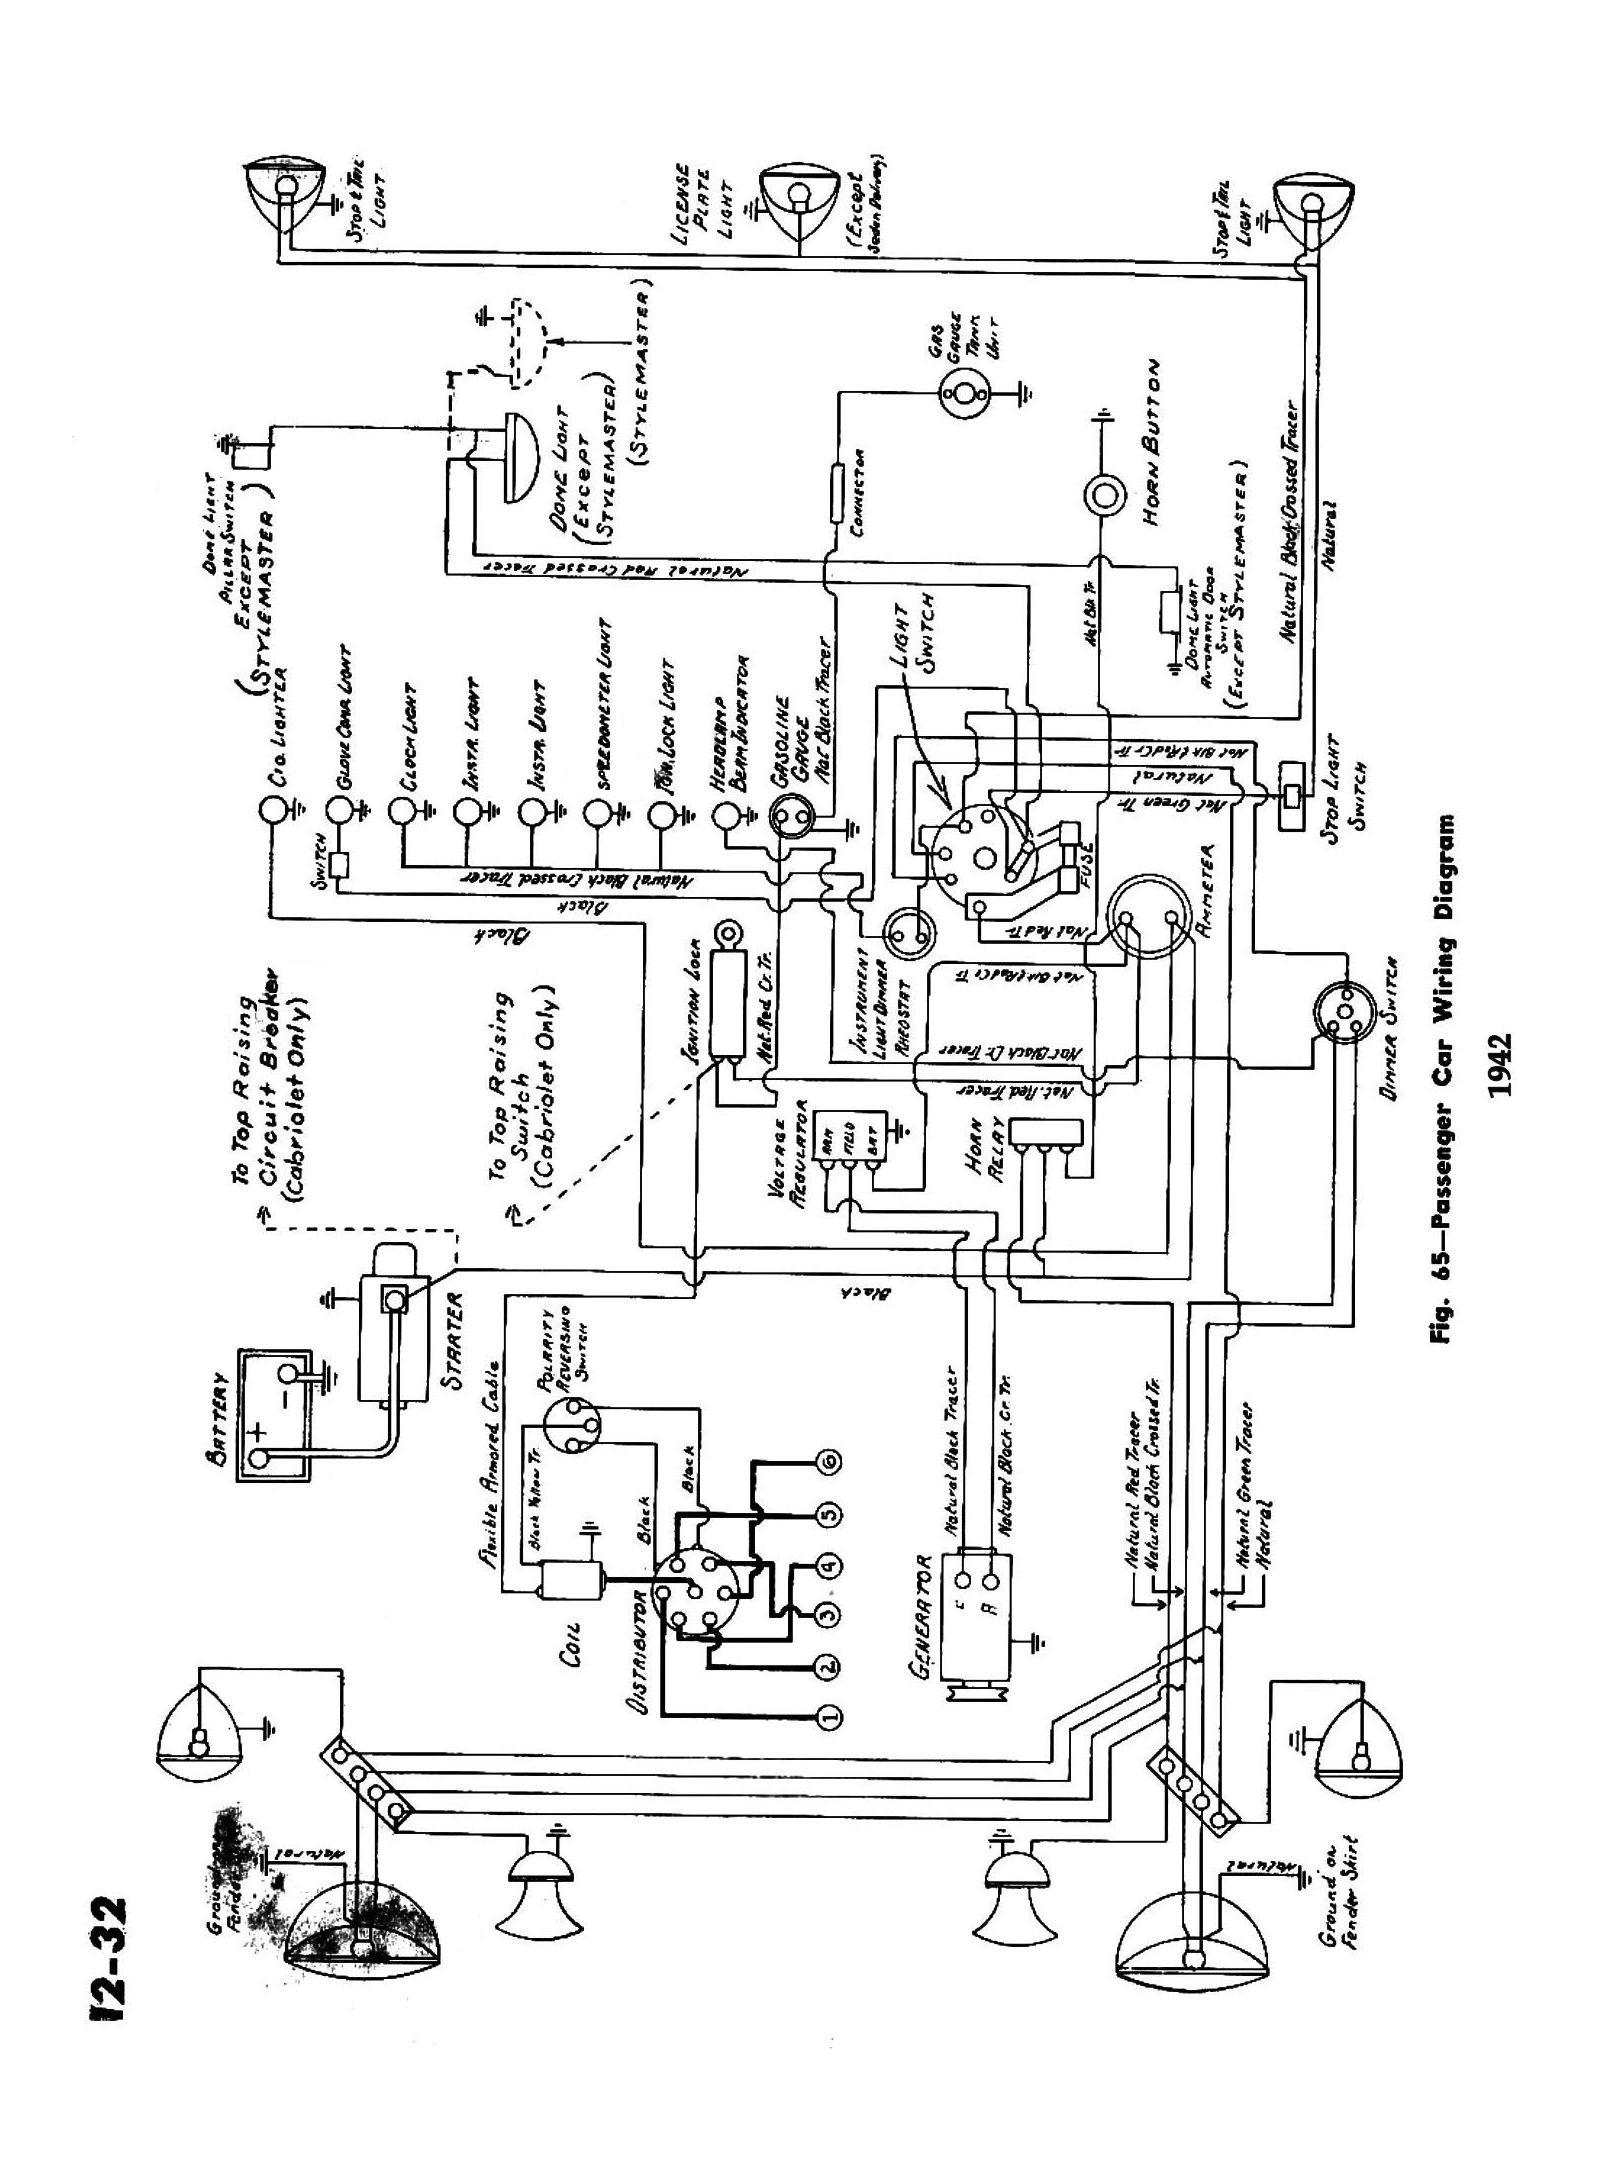 Wonderful Remote Car Starter Wiring Diagram Photos - Electrical ...